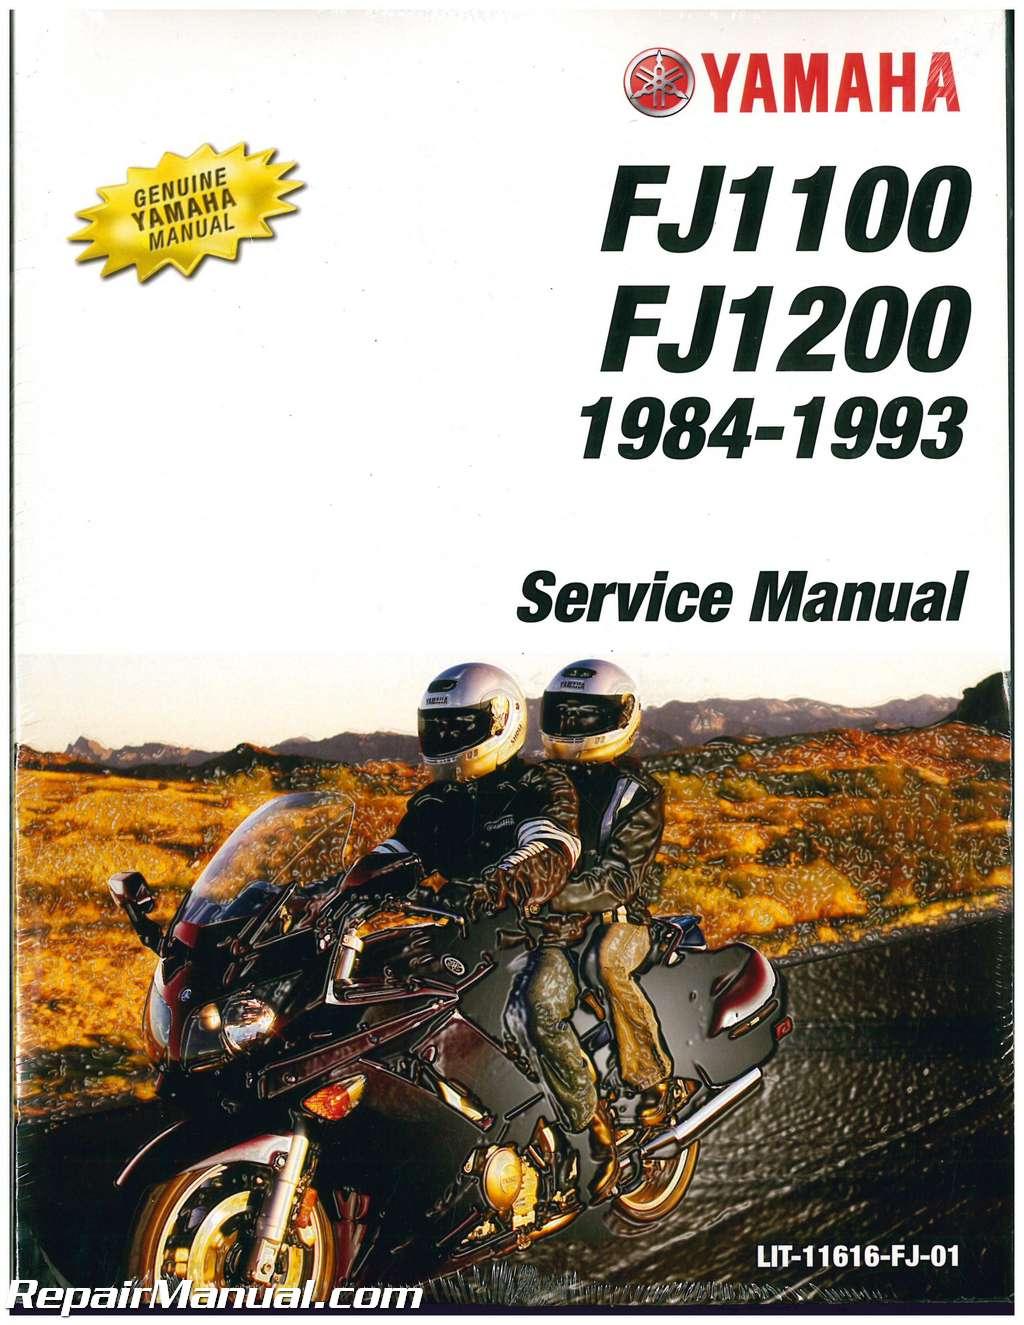 1984 1993 yamaha fj1100 fj1200 motorcycle service manual rh repairmanual com Yamaha FJ1200 Top Speed Yamaha FJ1200 Top Speed